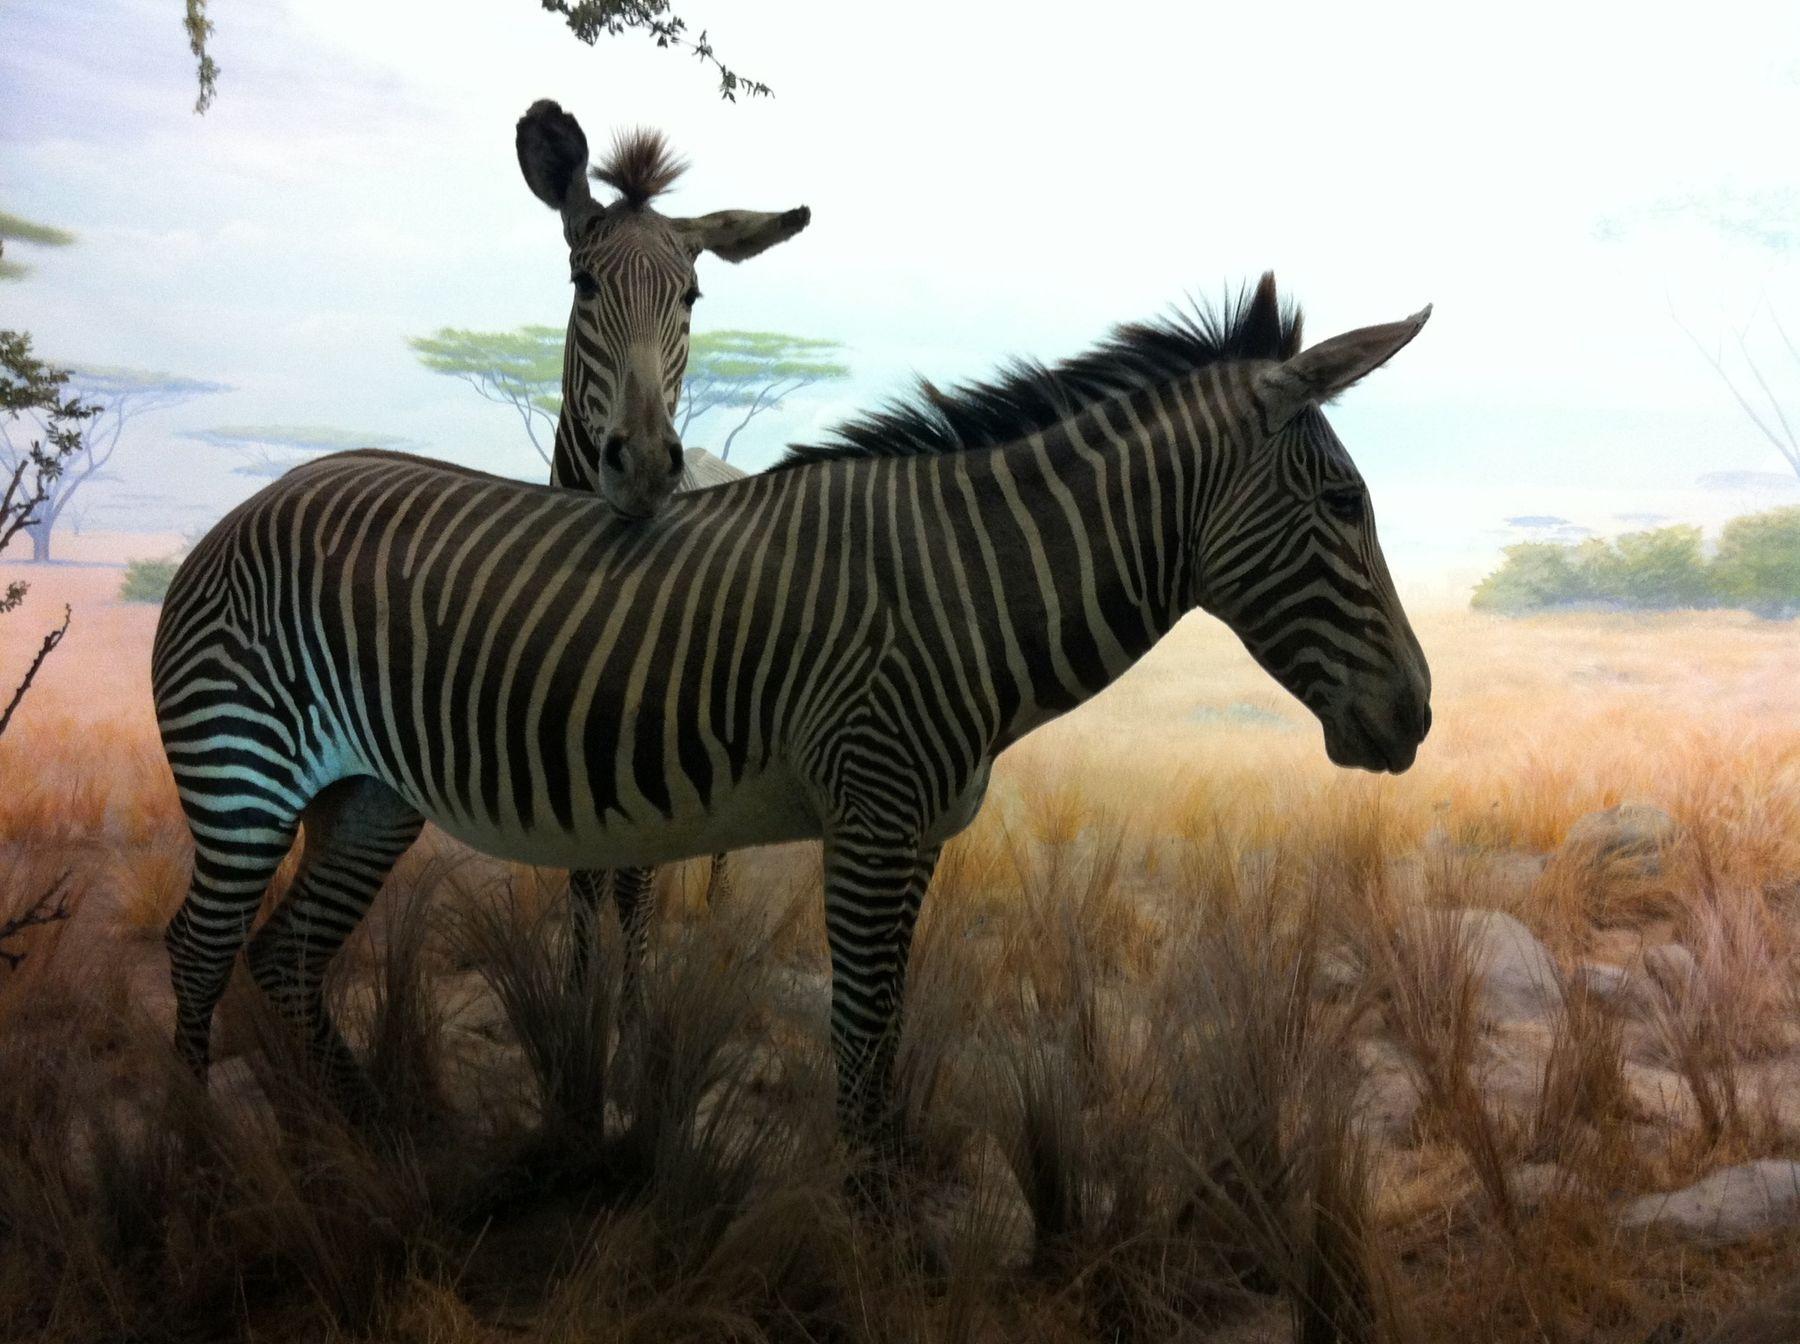 African Hall Zebras California Academy Of Sciences San Francisco